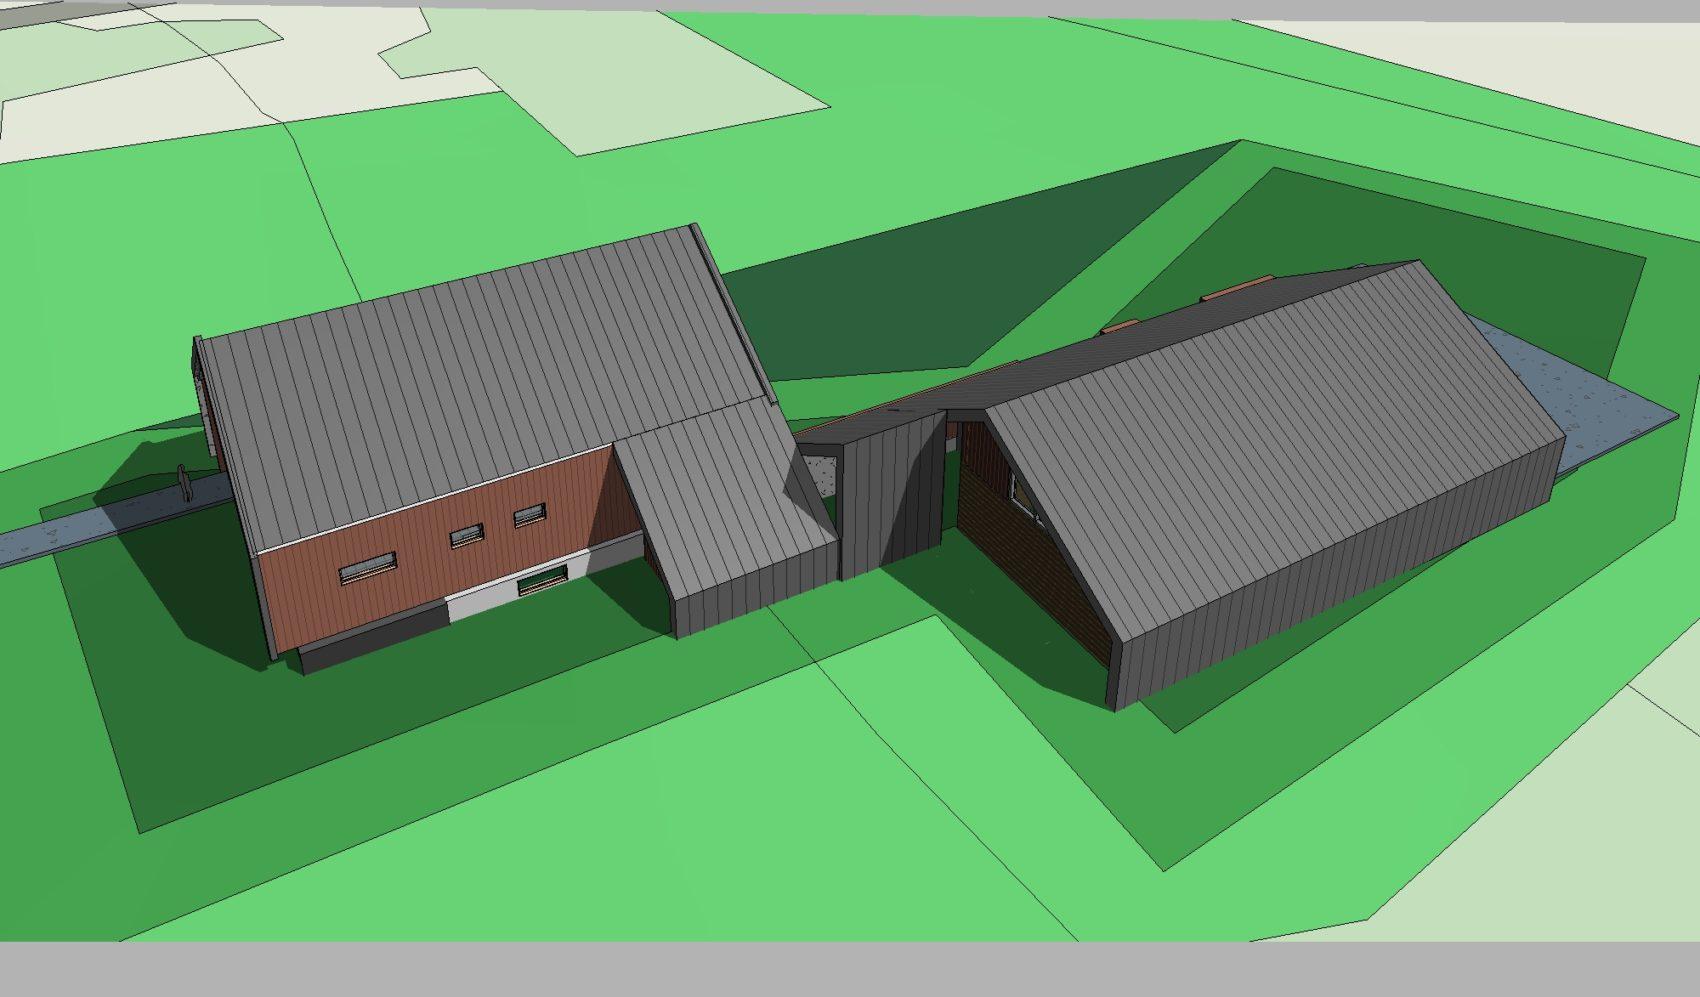 проект фермы-архитектор Никитин